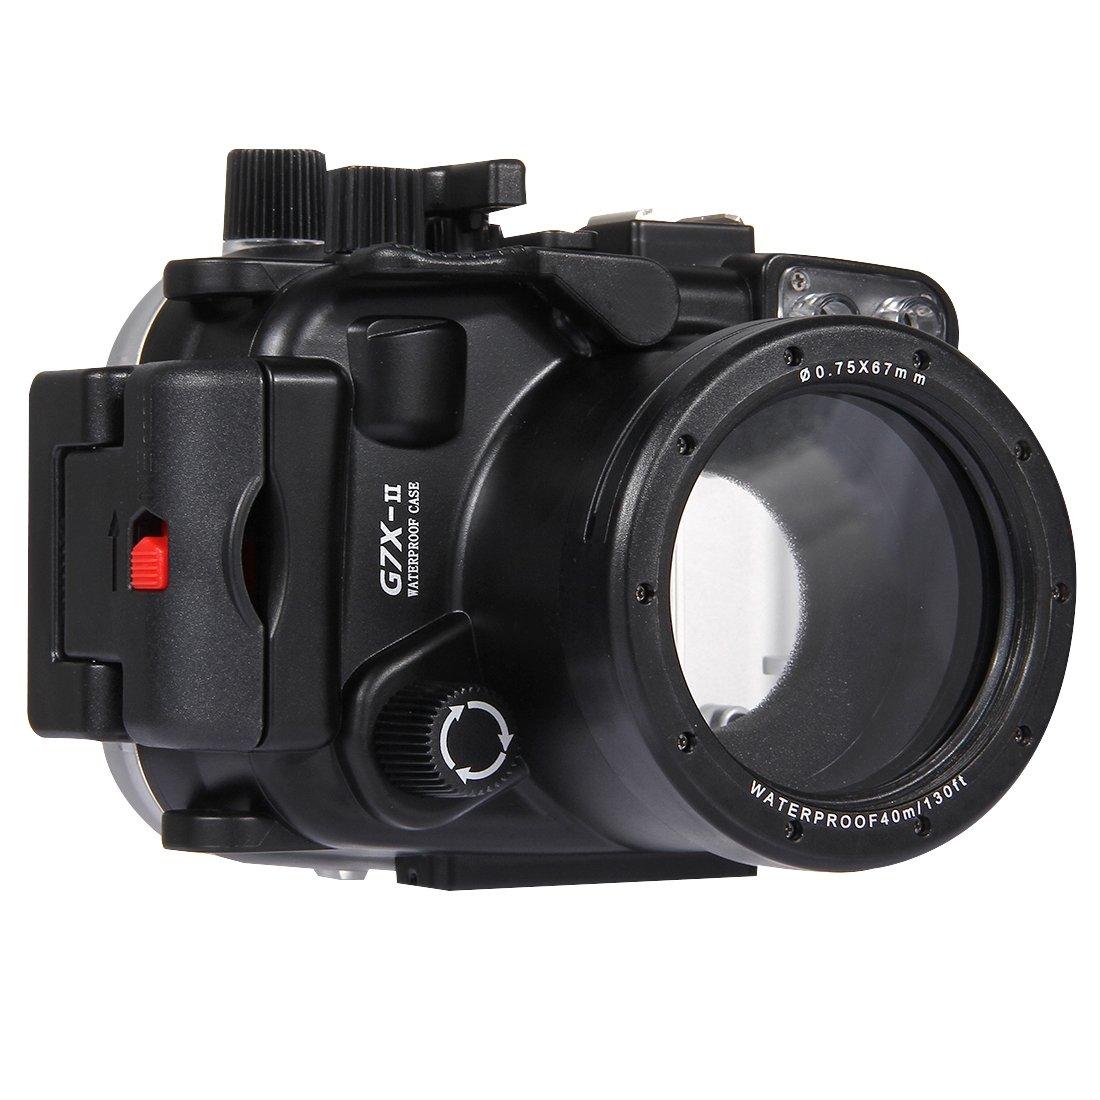 PULUZ 40m Underwater Depth Diving Case Waterproof Camera Housing for Canon G7 X Mark II